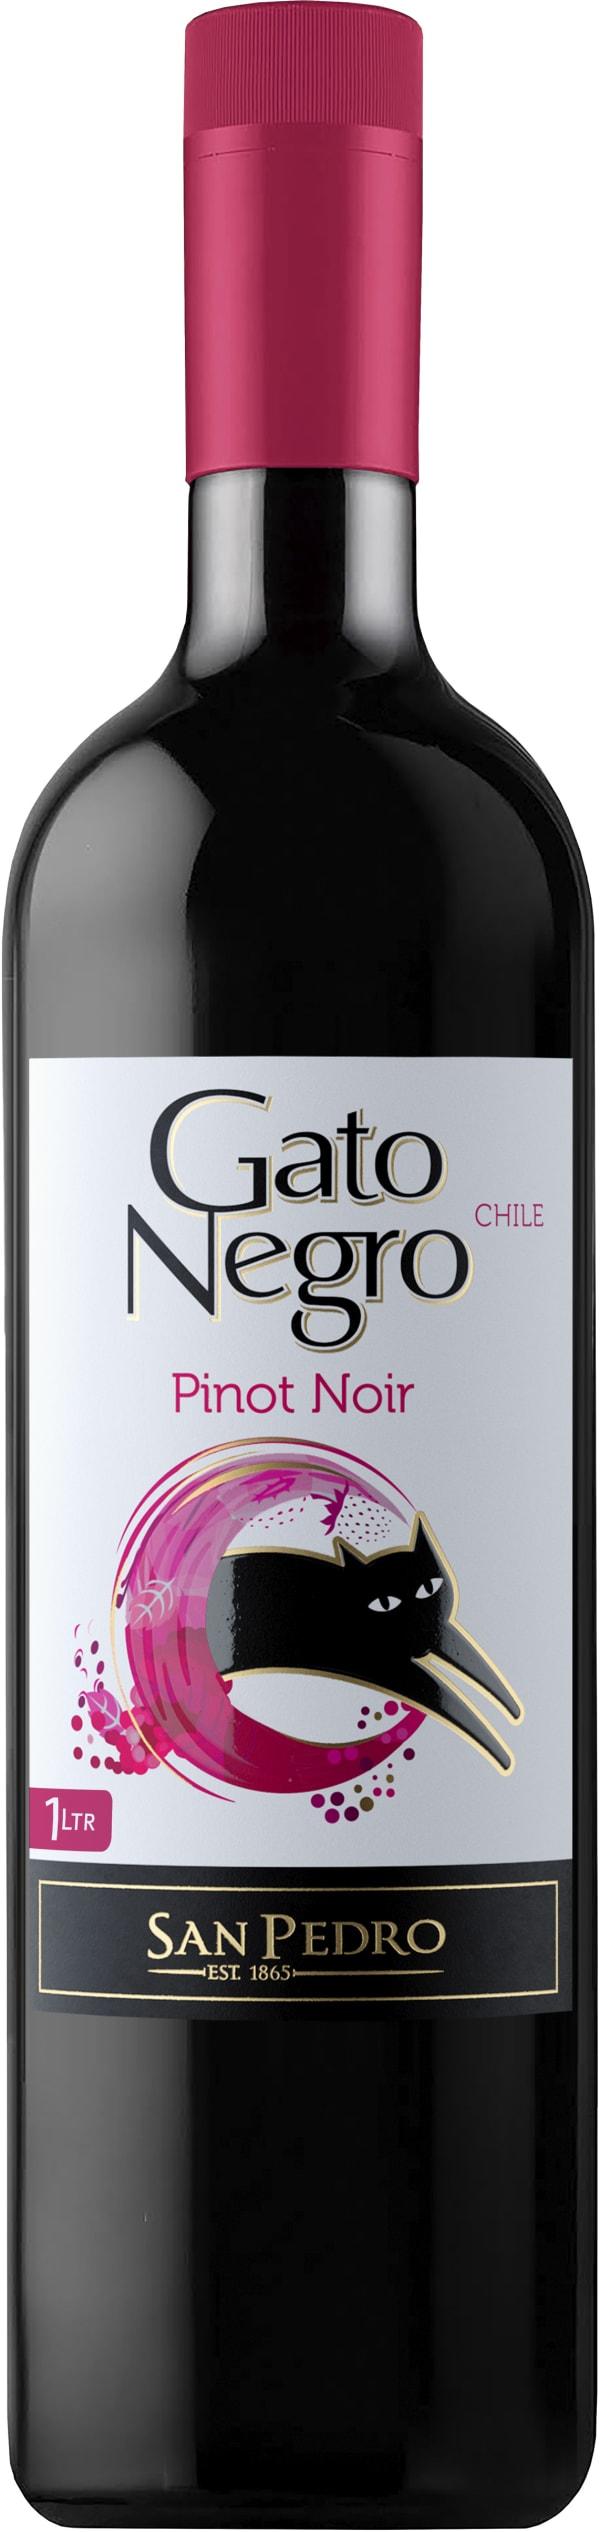 Gato Negro Pinot Noir 2017 plastflaska